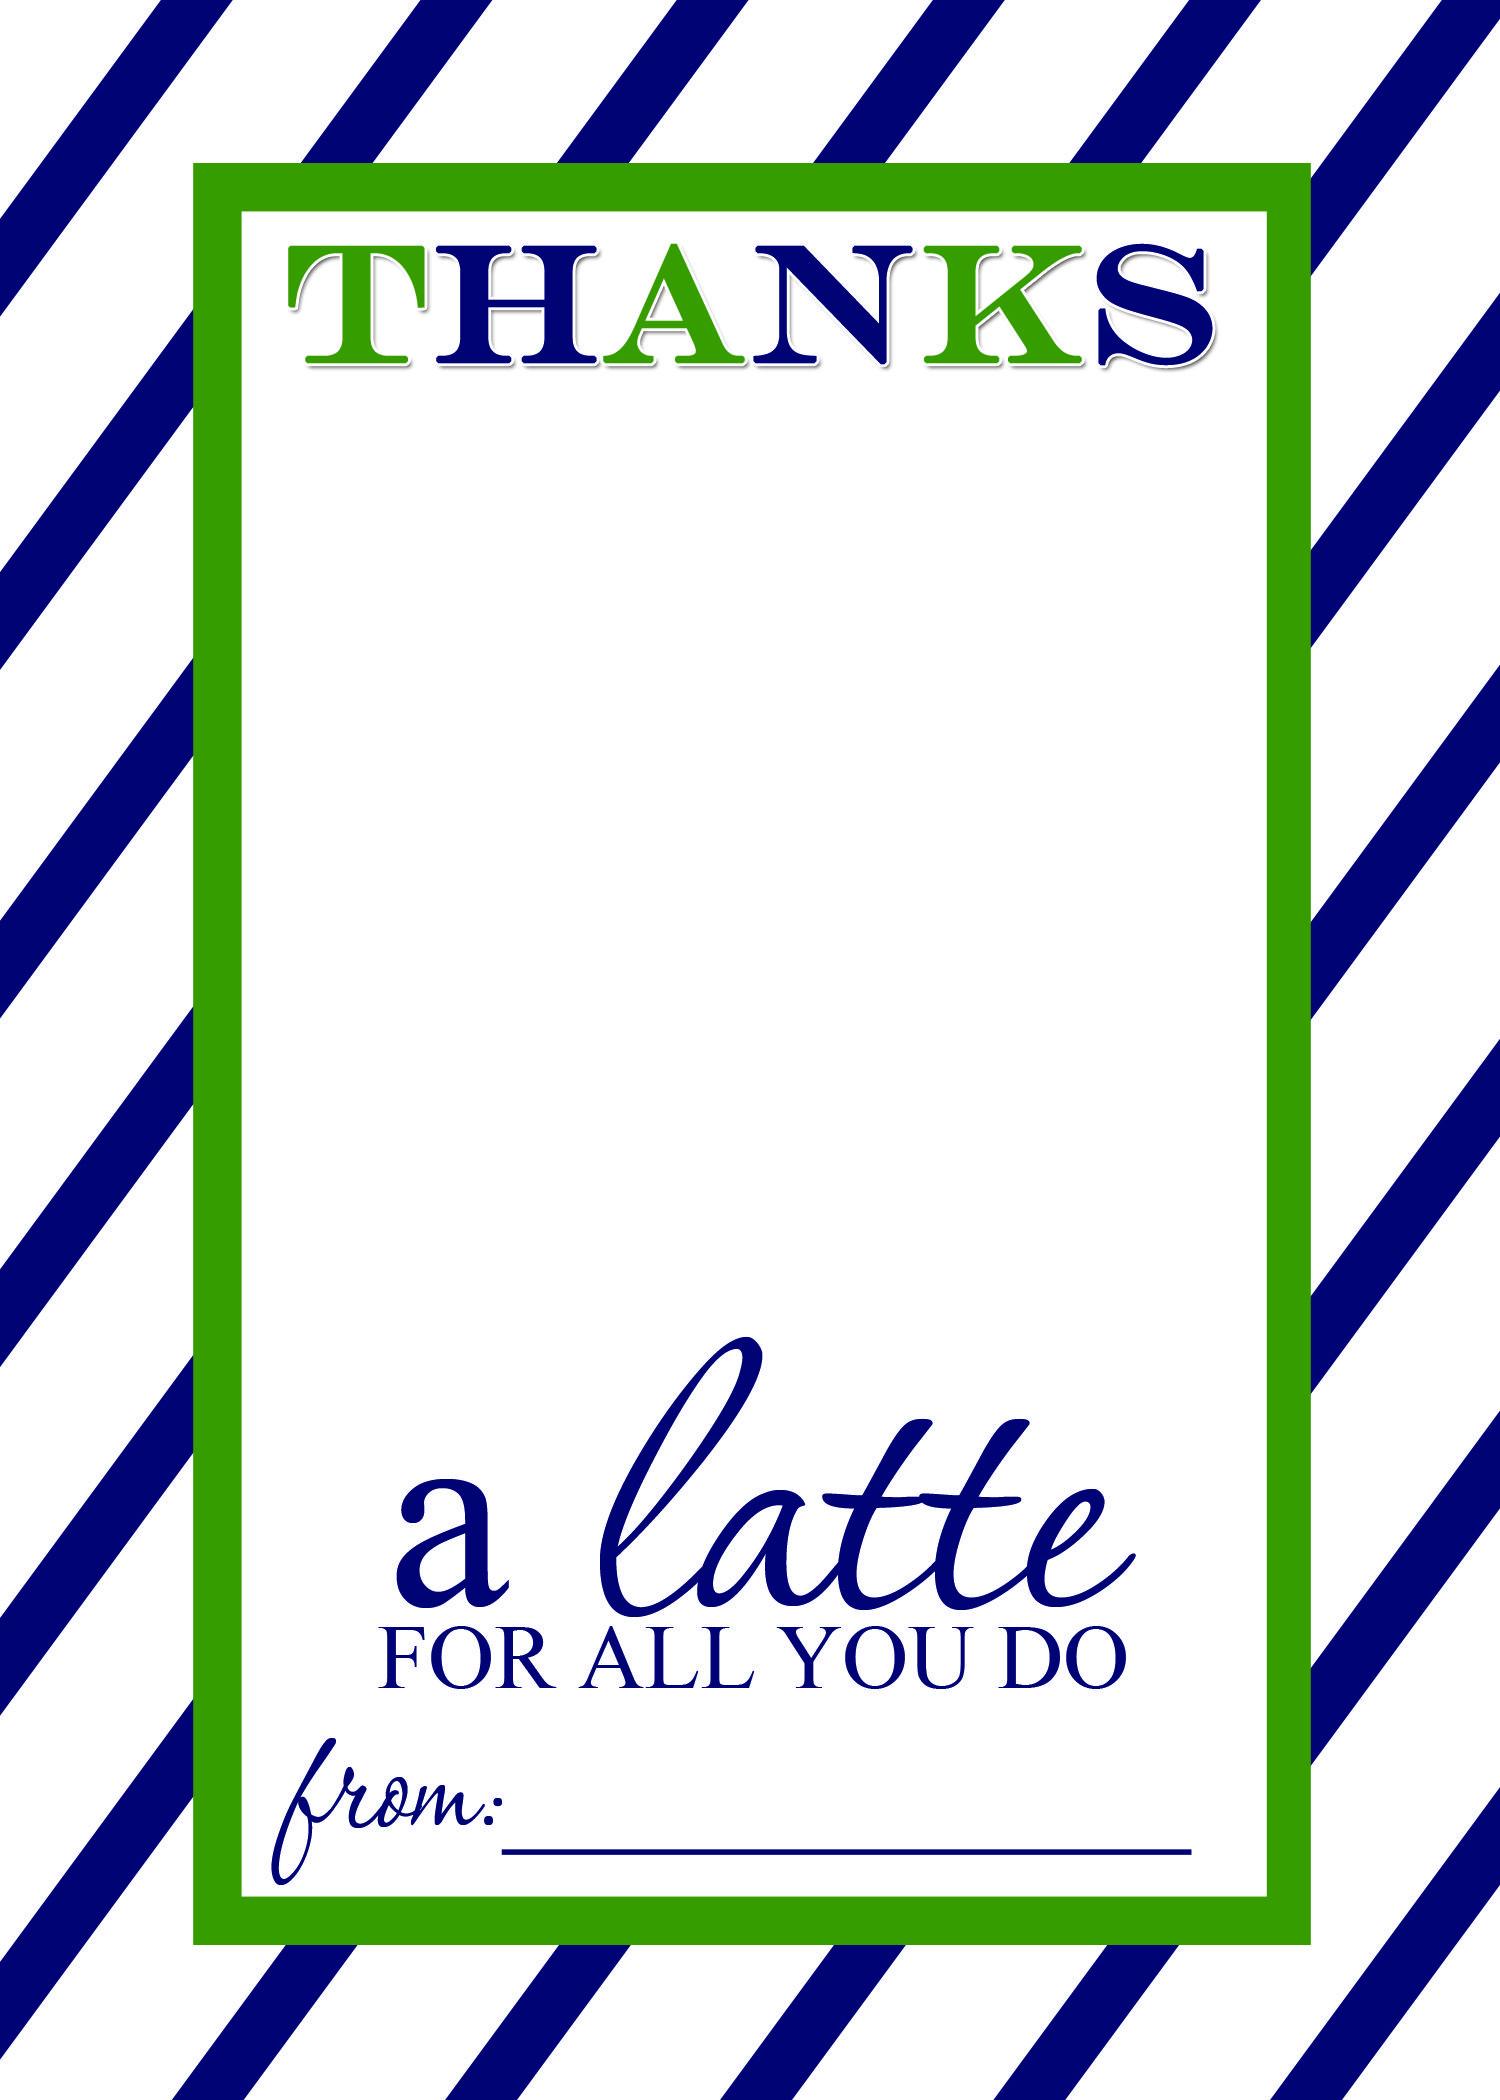 Teacher Appreciation Gift Idea - Thanks A Latte Free Printable Card - Thanks A Latte Free Printable Tag